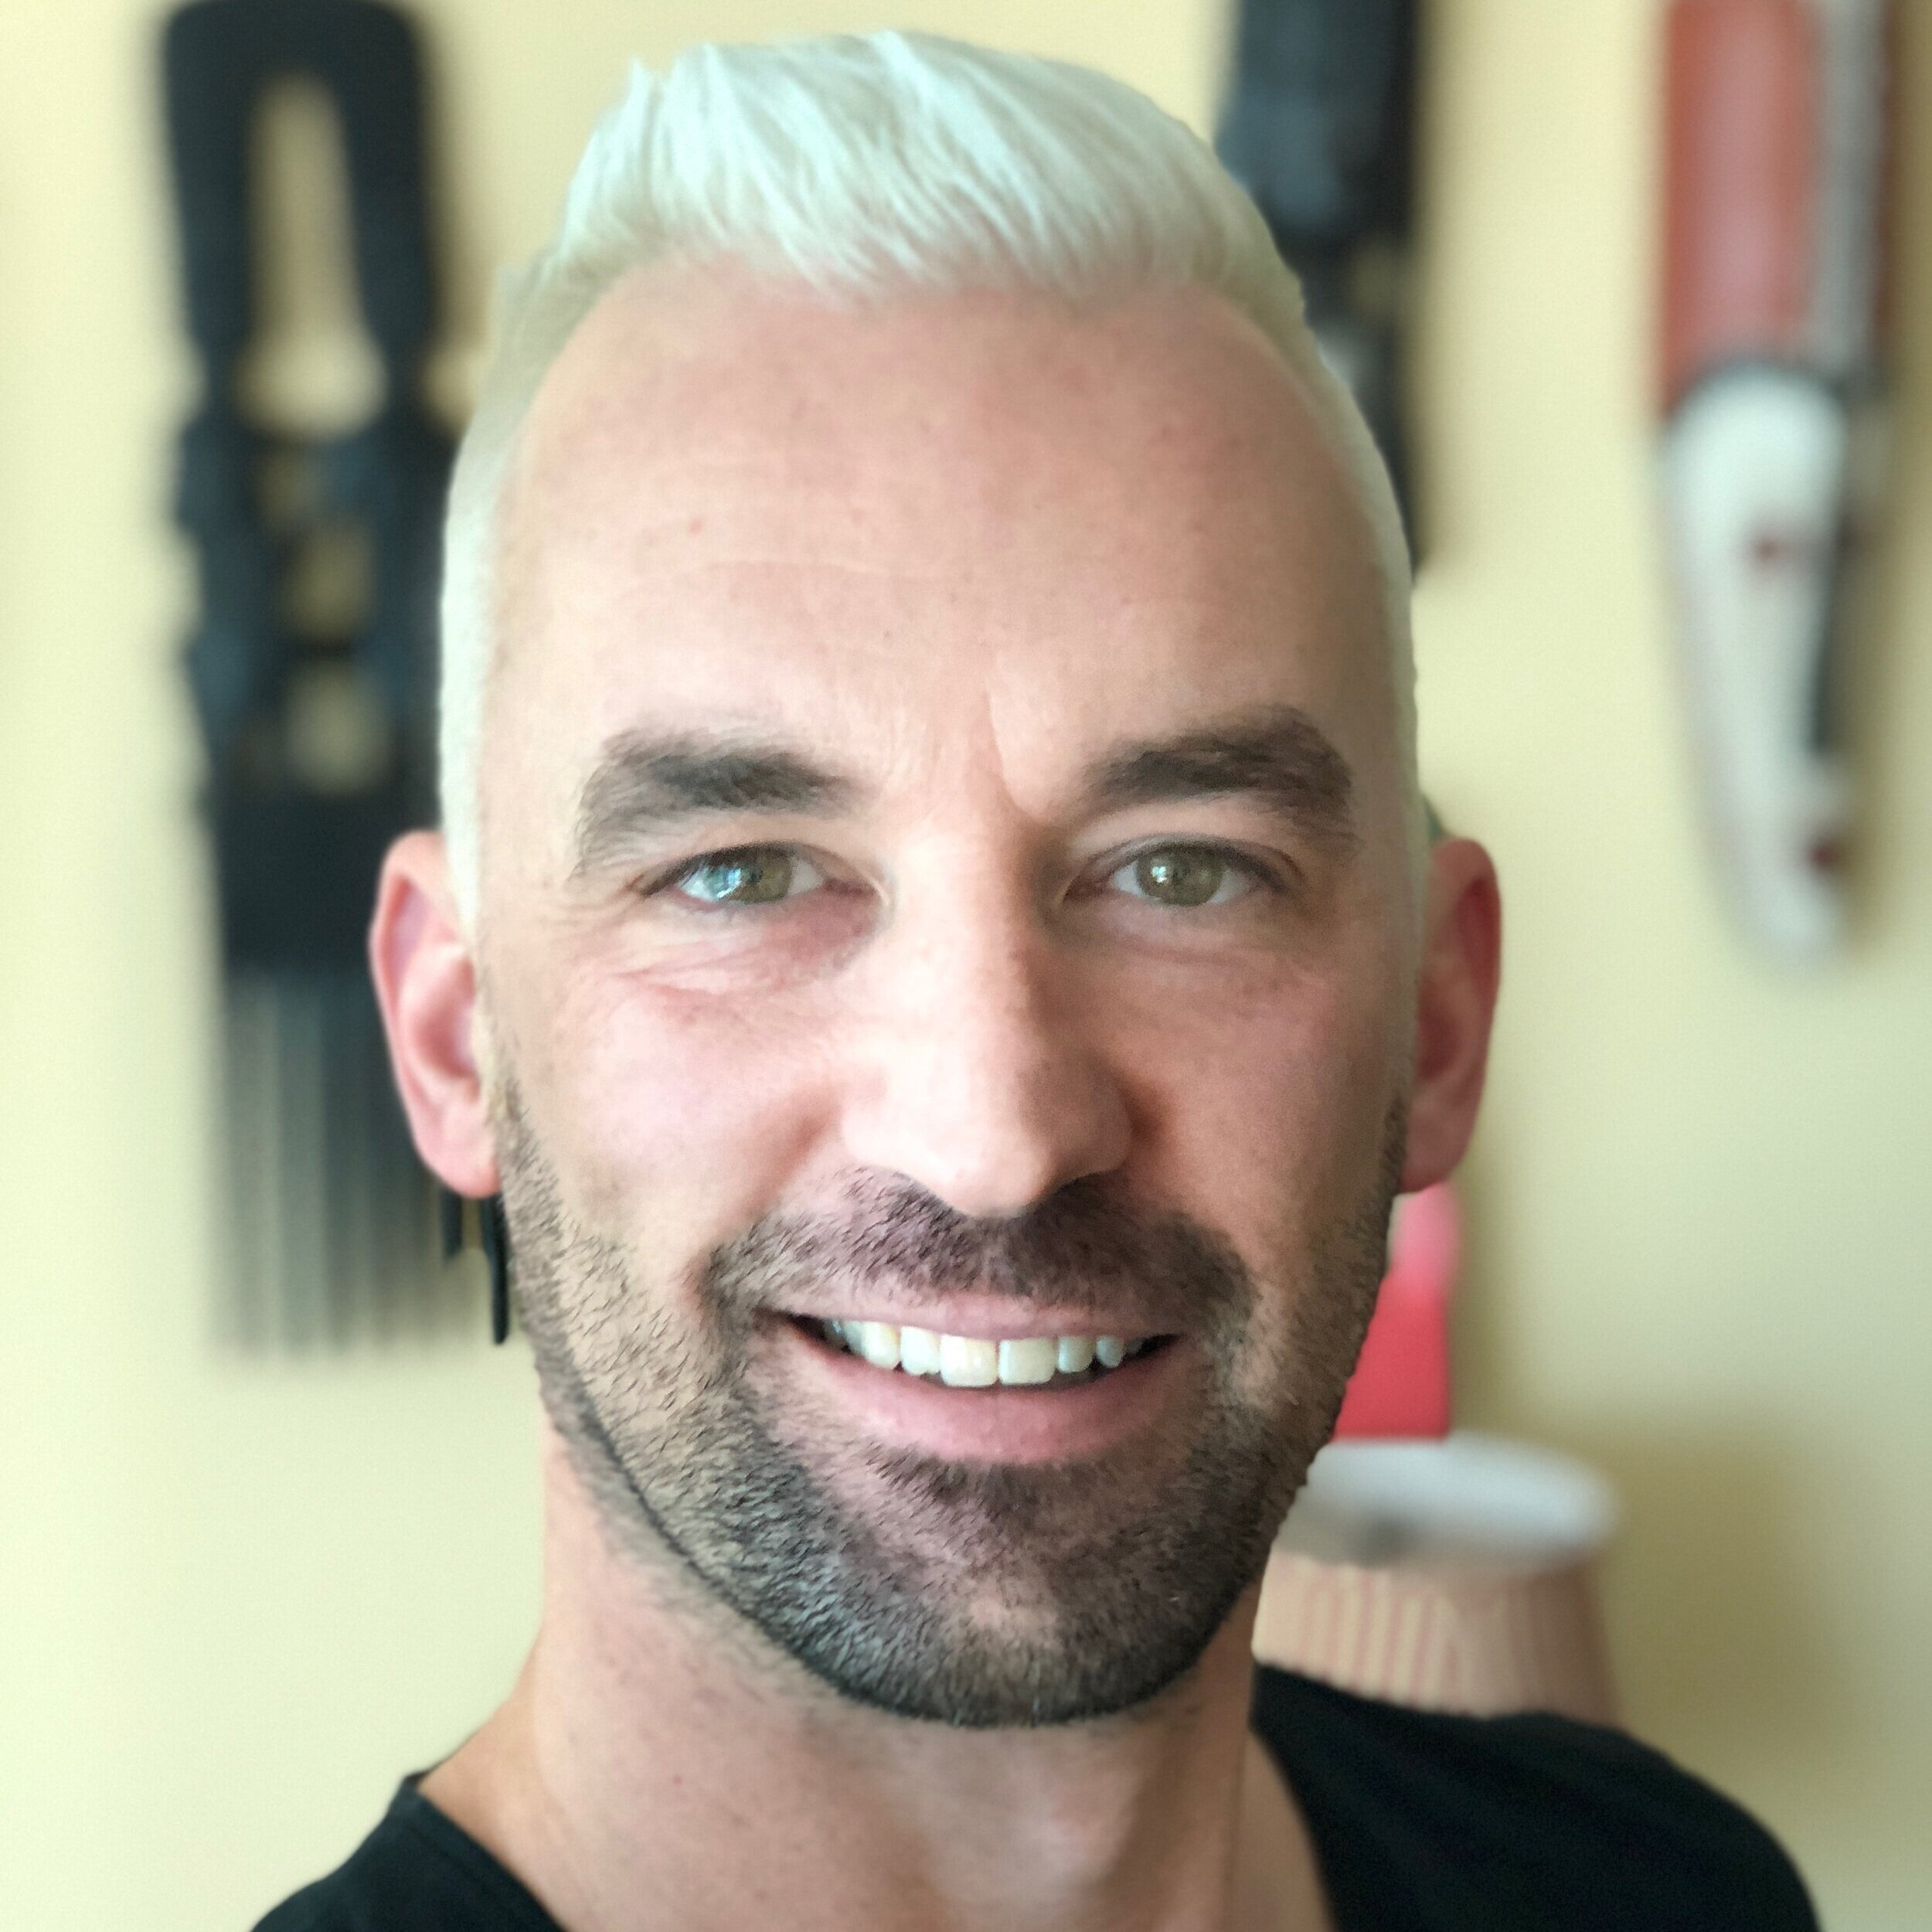 Ryan lathrum - Director, Community & Inclusion